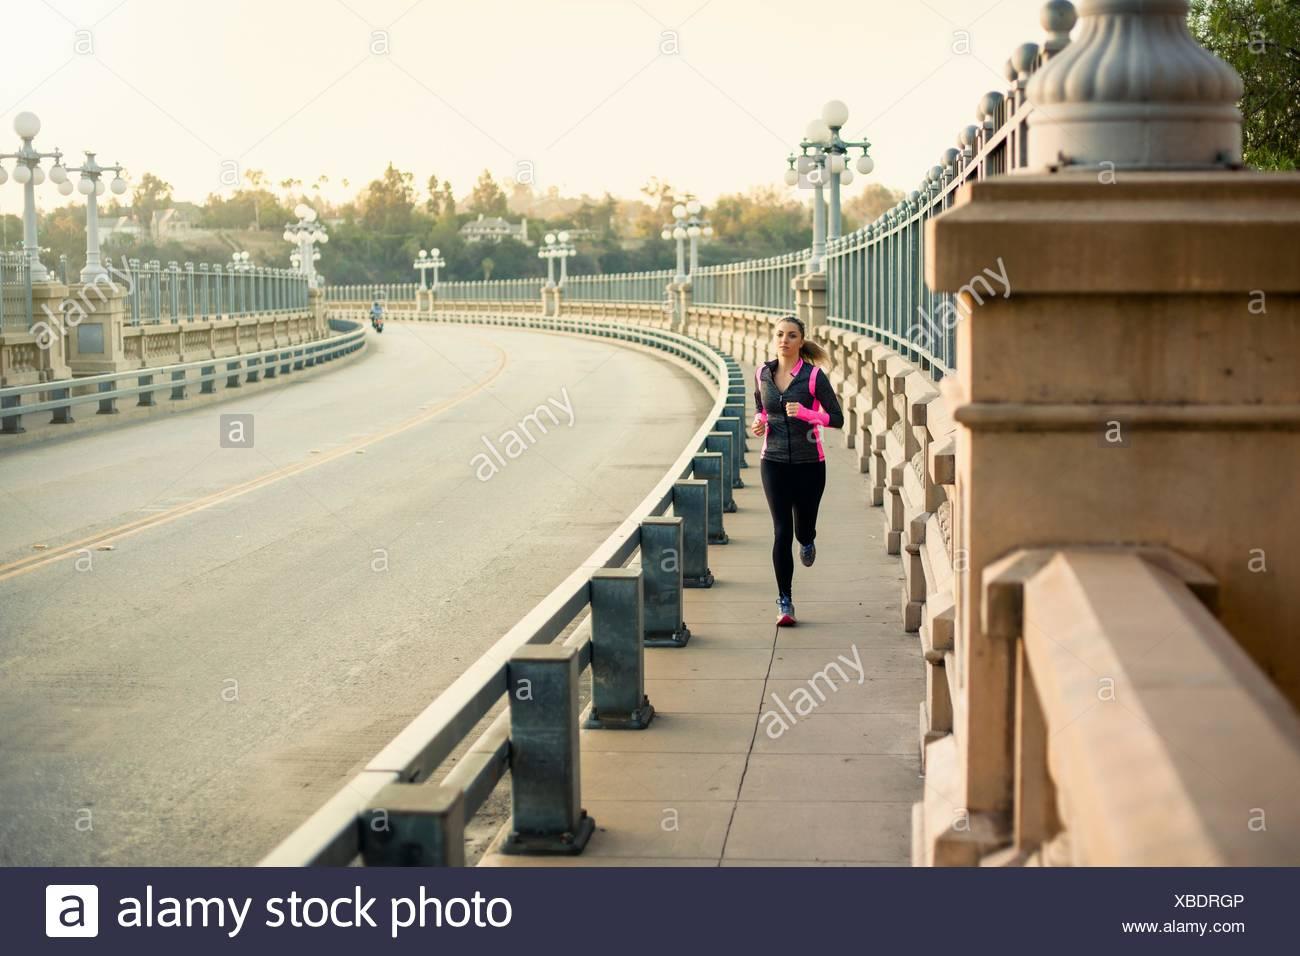 Jogger laufen auf Brücke, Arroyo Seco Park, Pasadena, Kalifornien, USA Stockbild